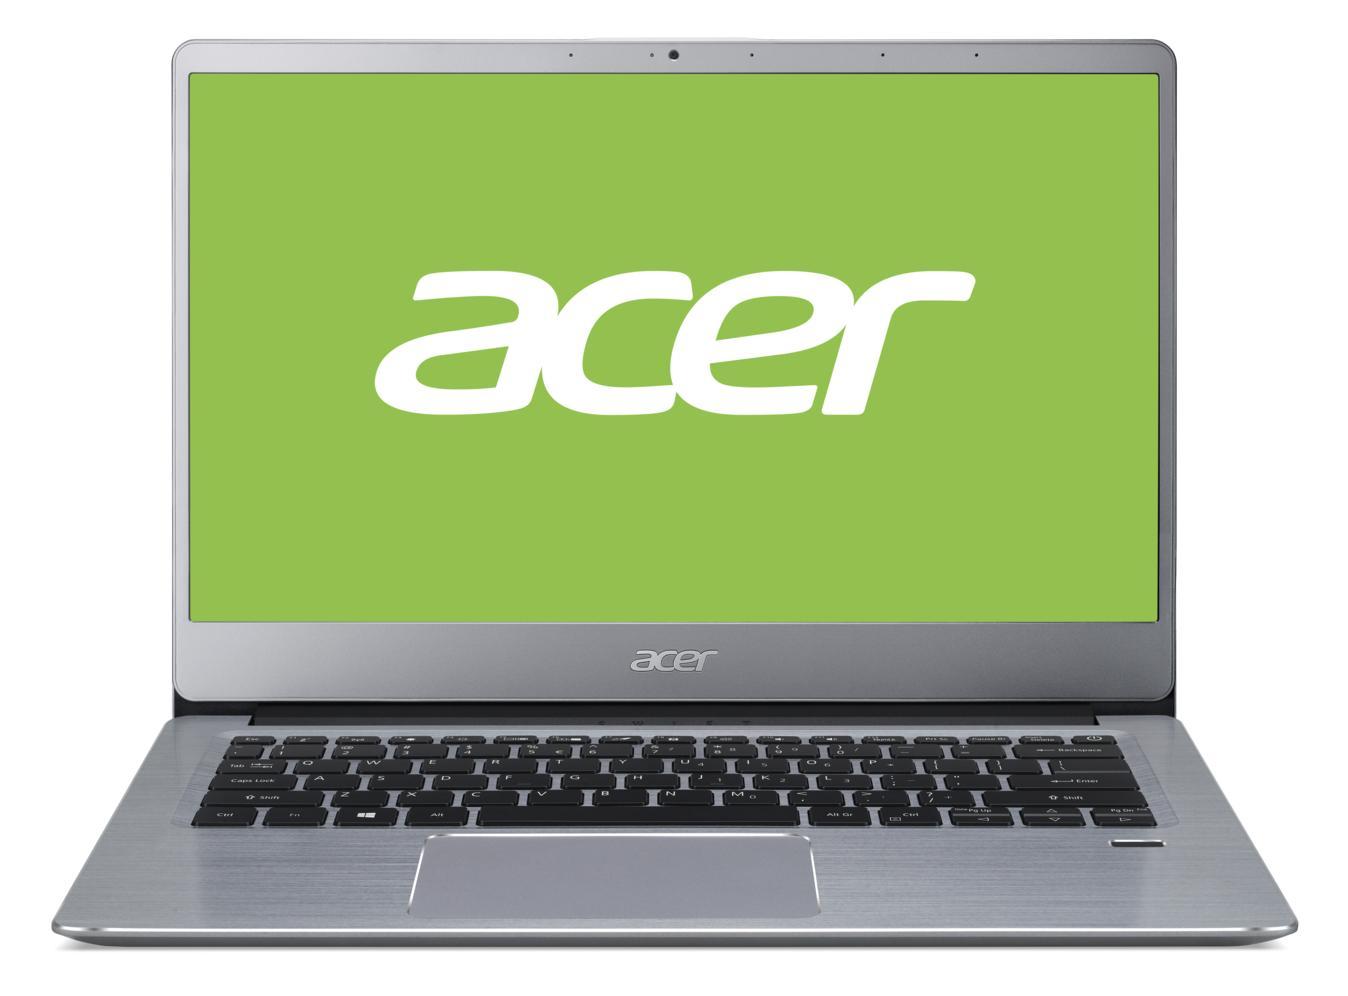 Acer Nitro 5 and Swift 3 updates bring 2nd gen AMD Ryzen 7 to the